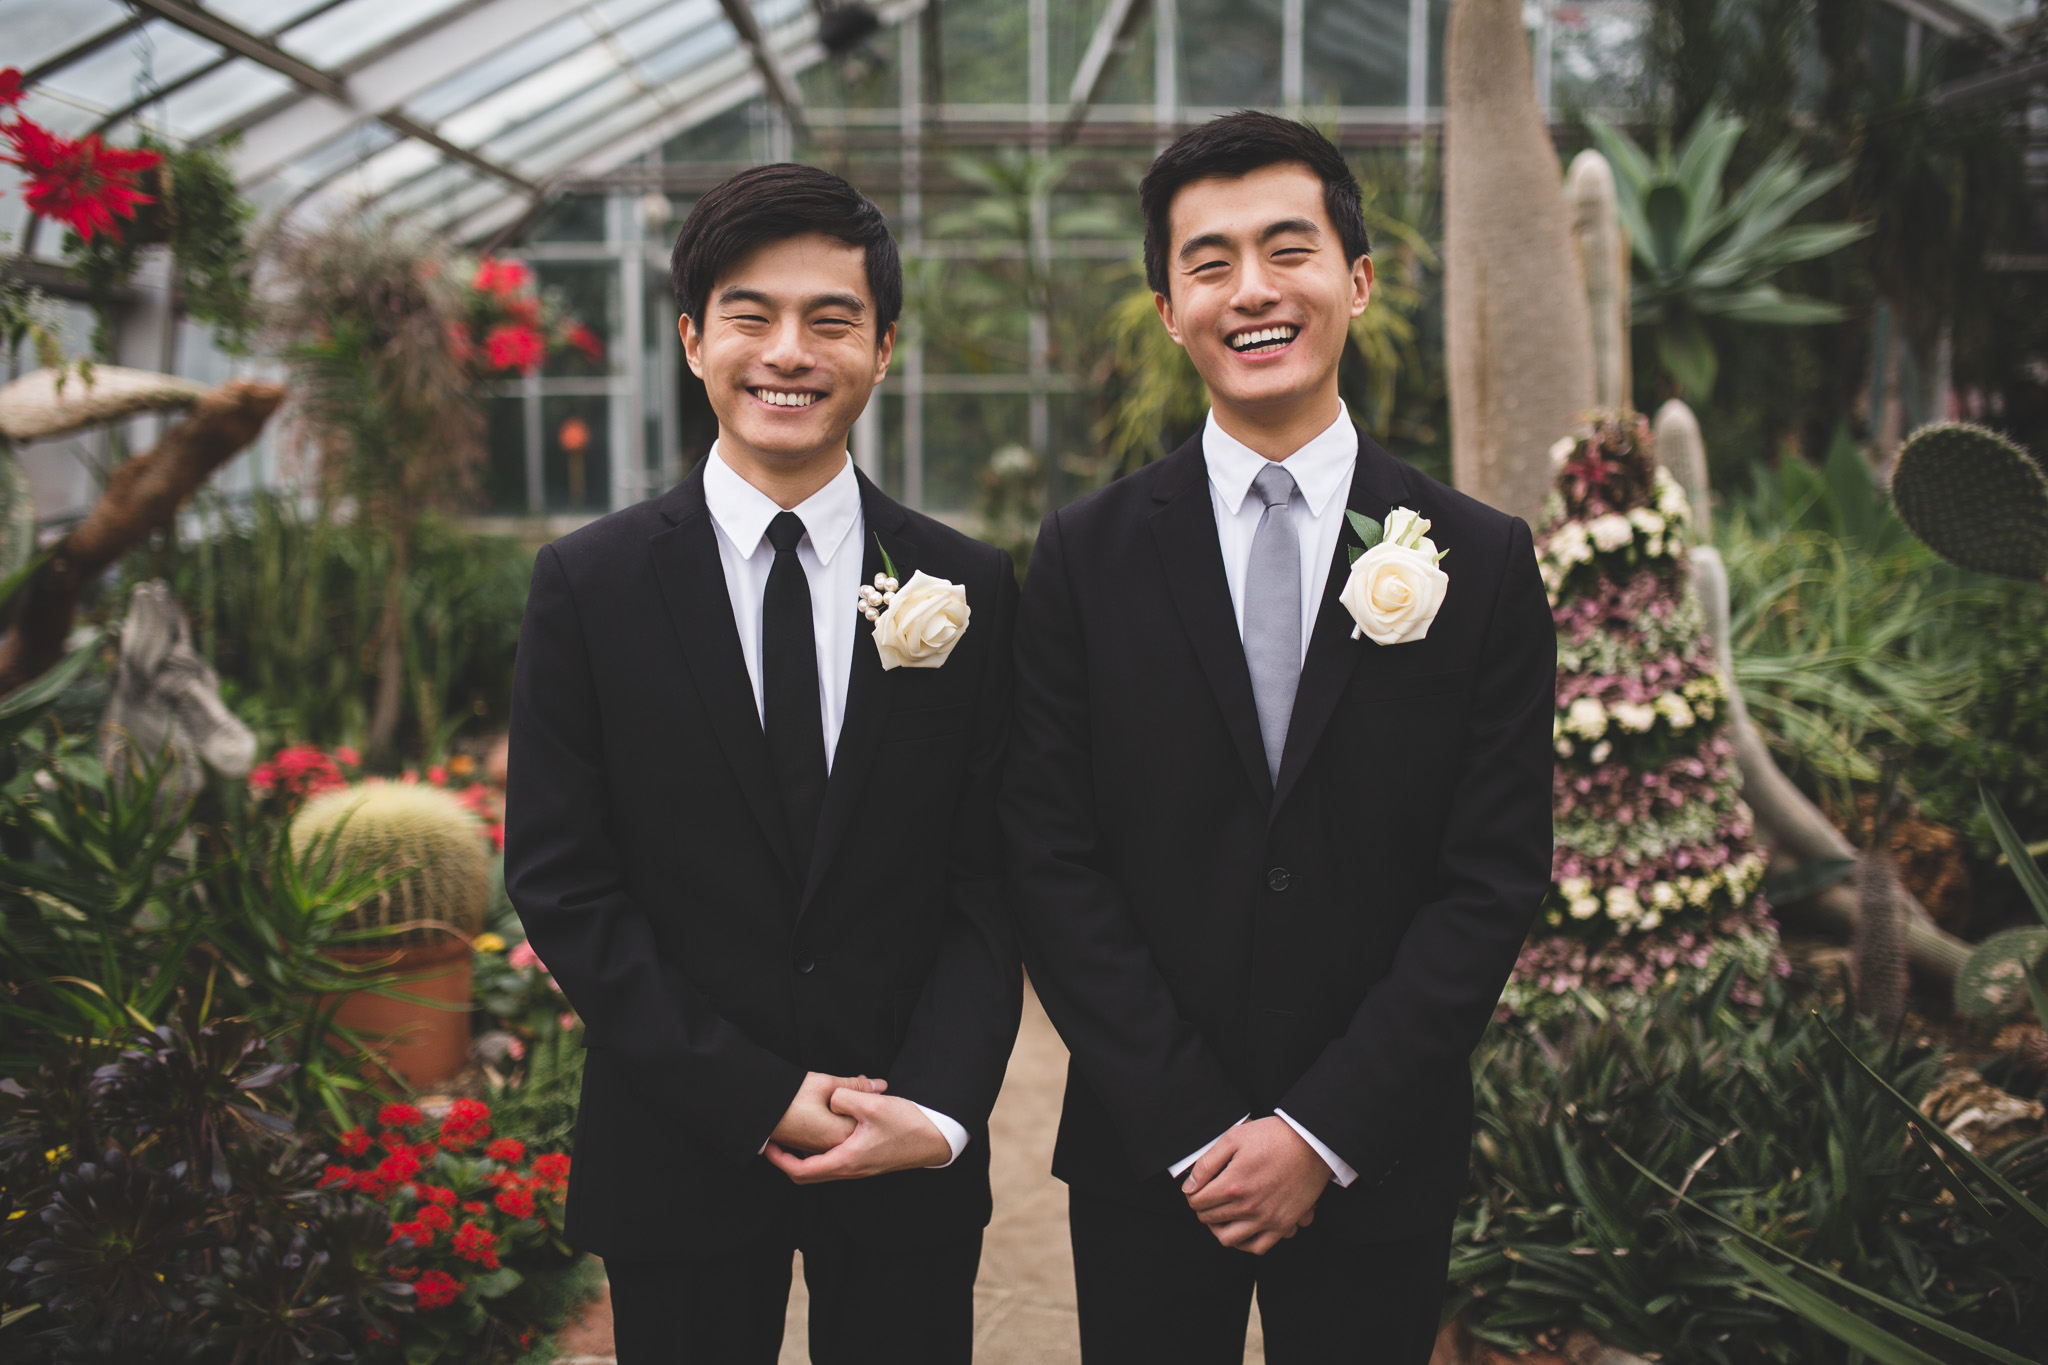 Natural-candid-wedding-photos-Ottawa